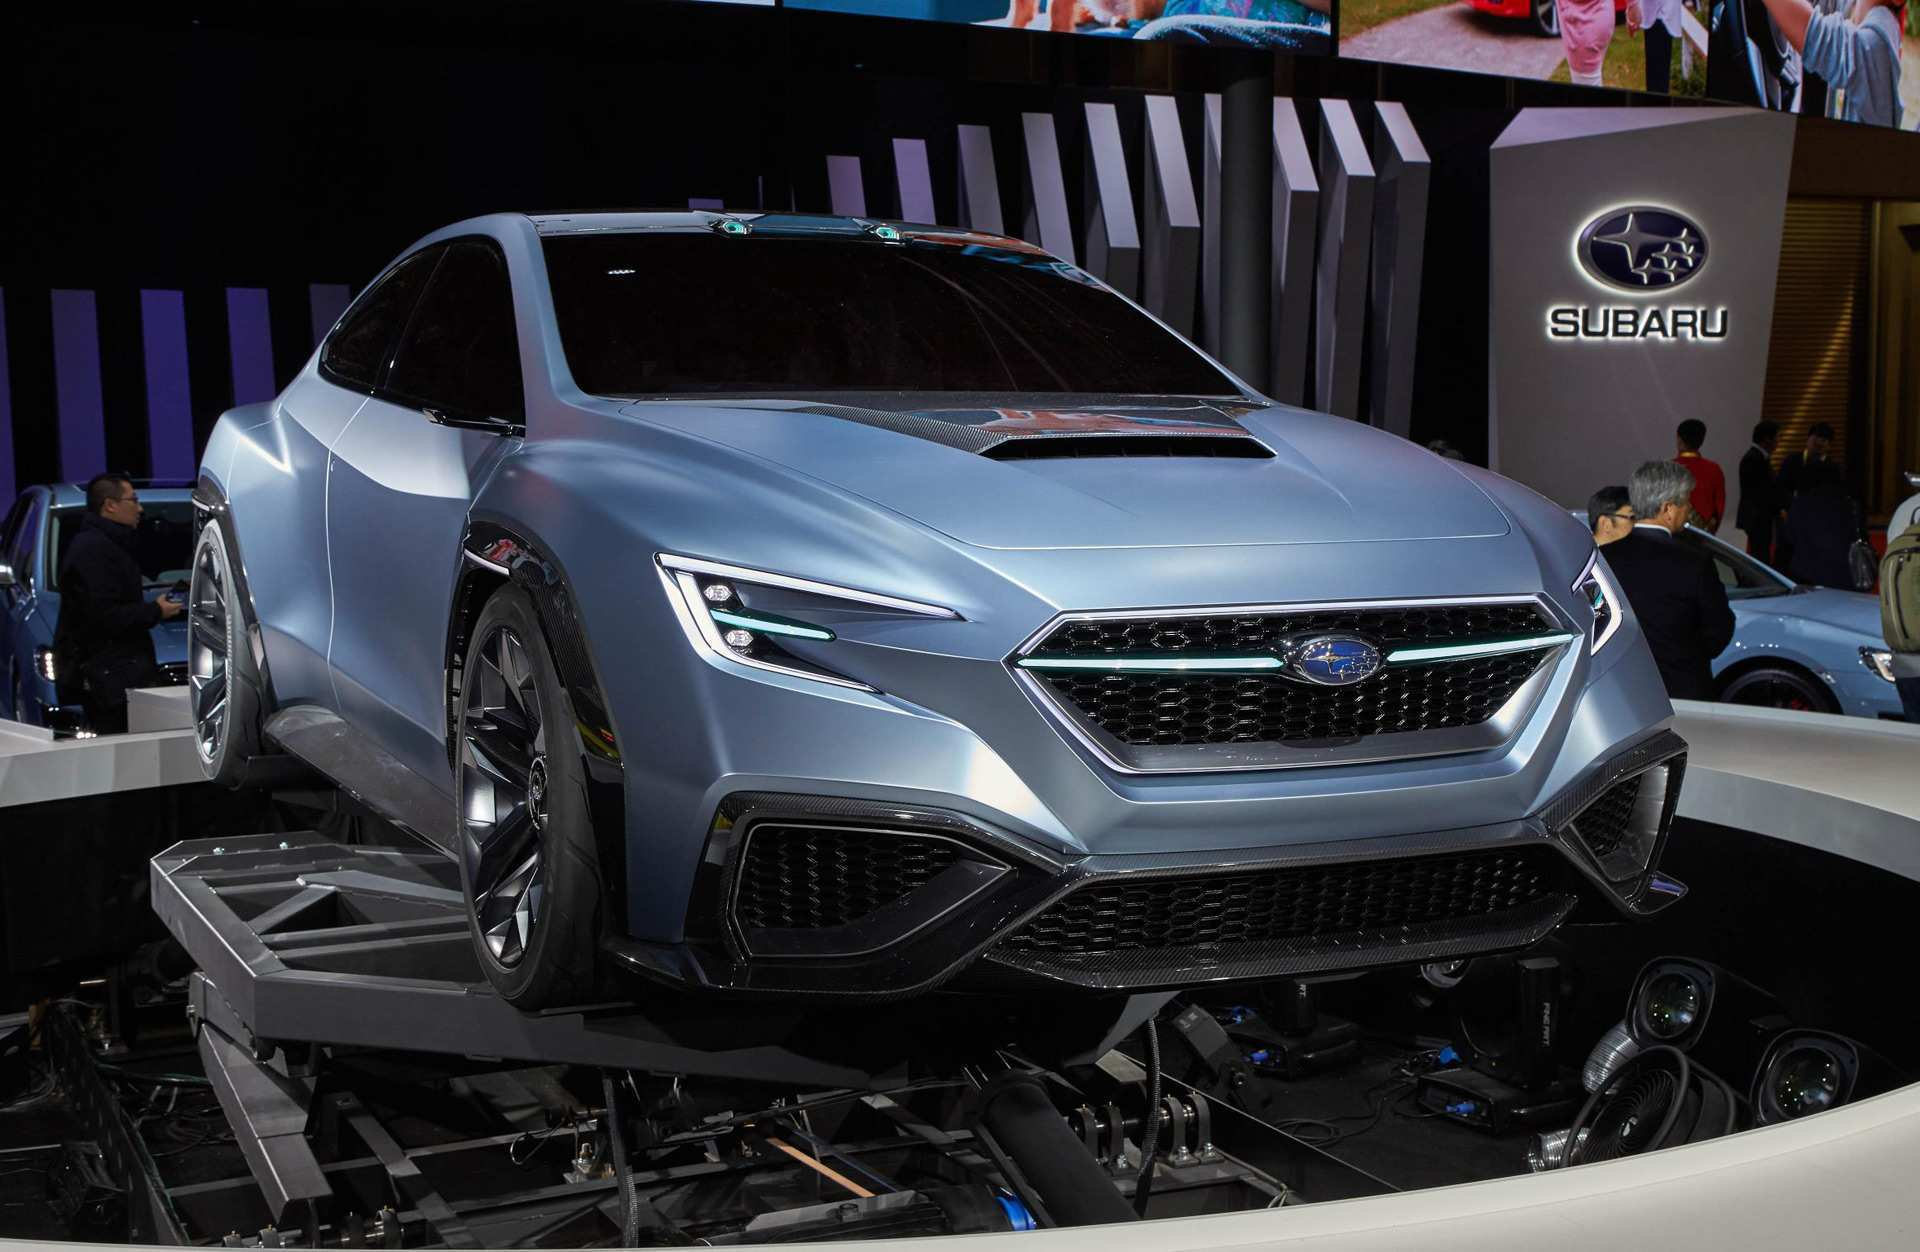 77 All New 2020 Subaru Viziv Style by 2020 Subaru Viziv